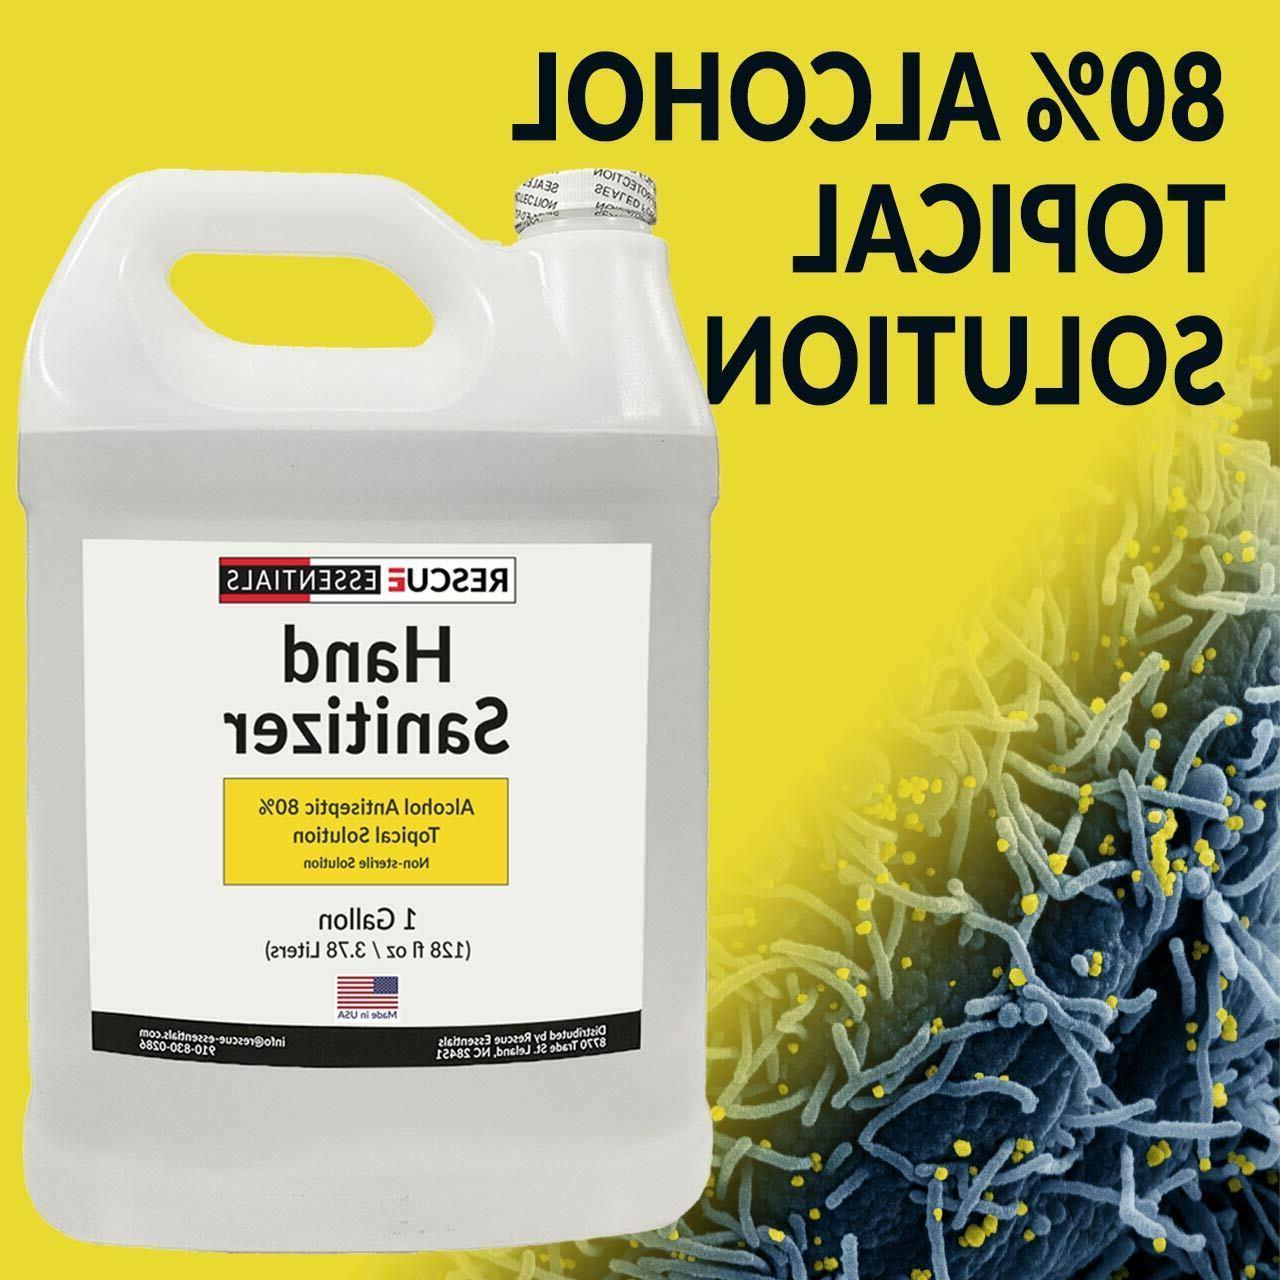 Liquid Hand Sanitizer -4 Oz, 32 Oz, 1 Gallon, 5 Gal & Auto D